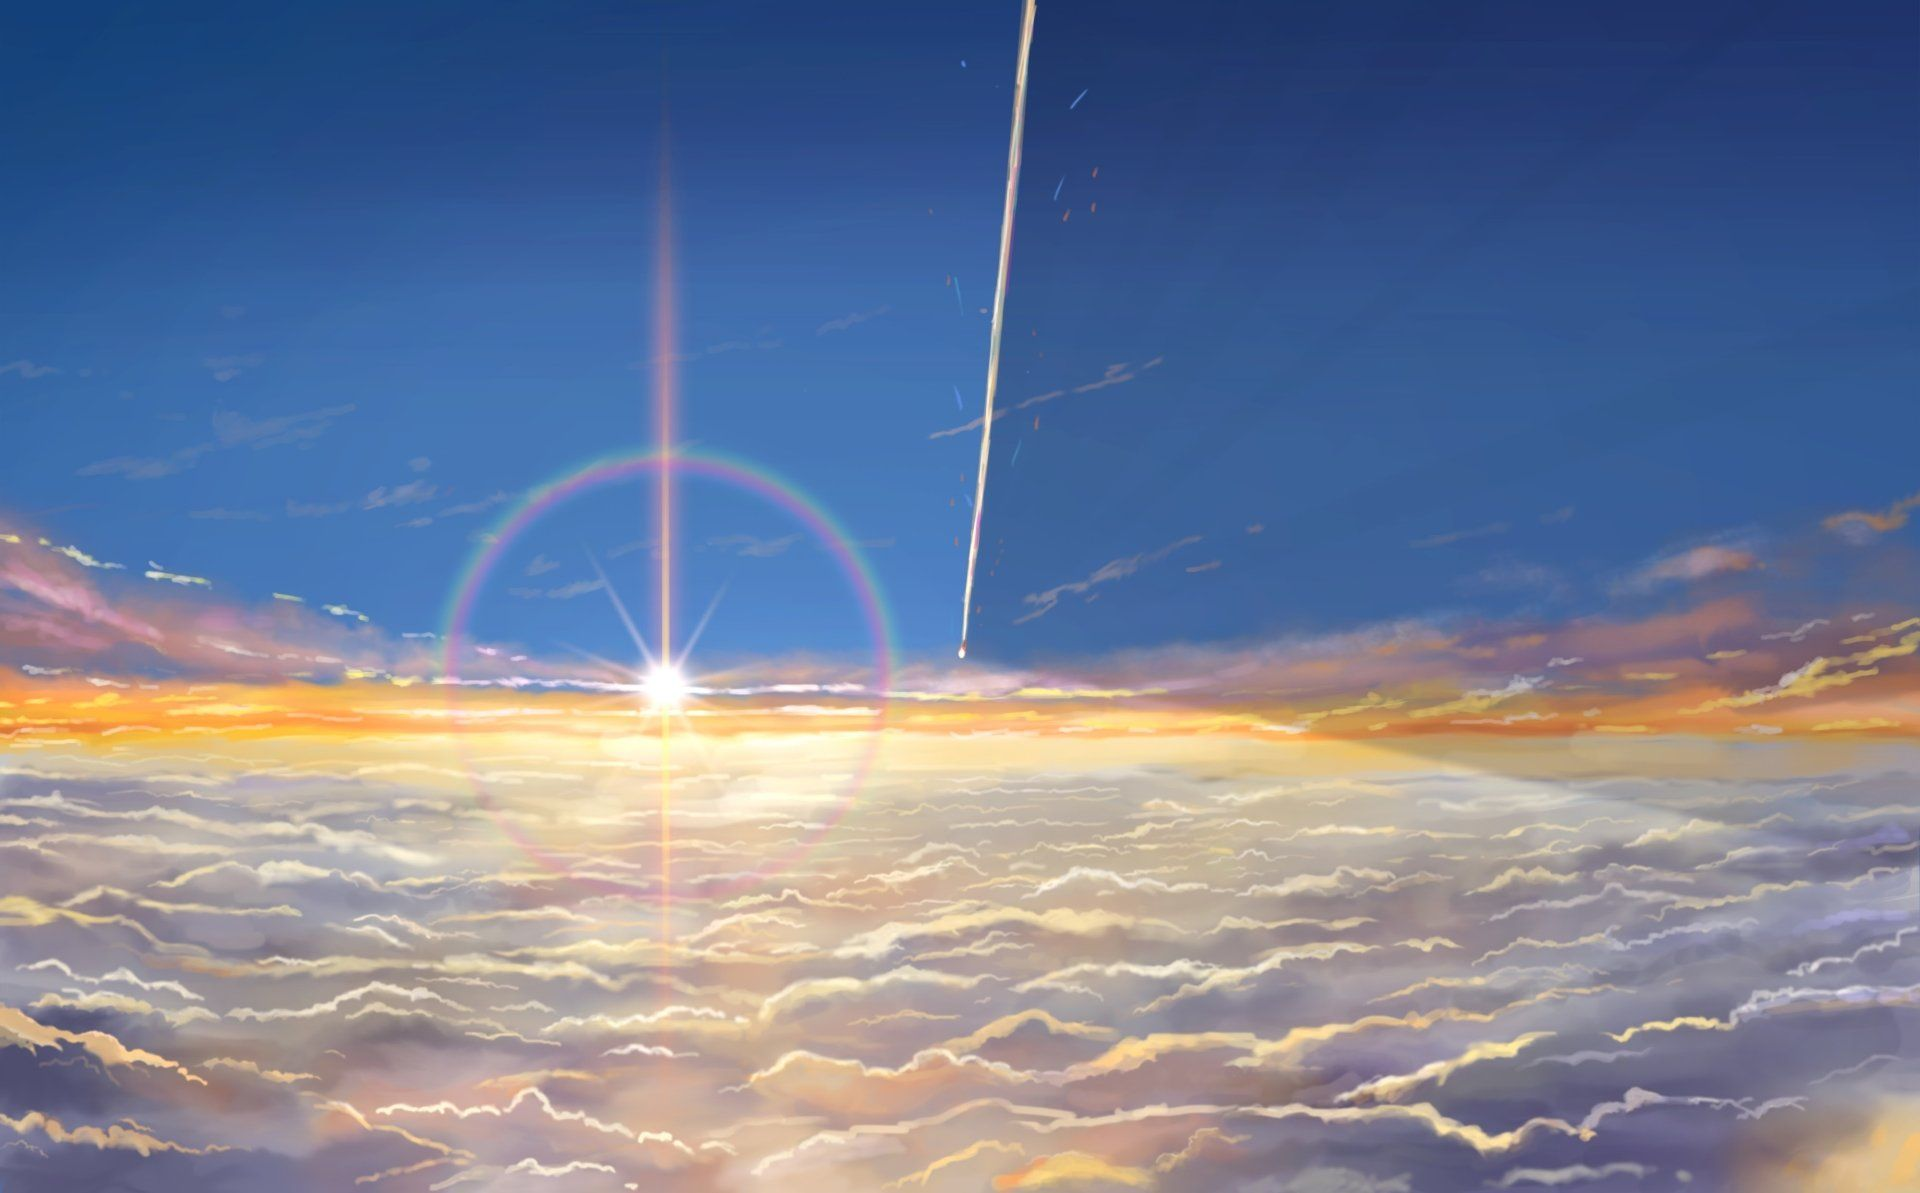 Anime Your Name Kimi No Na Wa Wallpaper Wallpaper Backgrounds Kimi No Na Wa Background Images Wallpapers